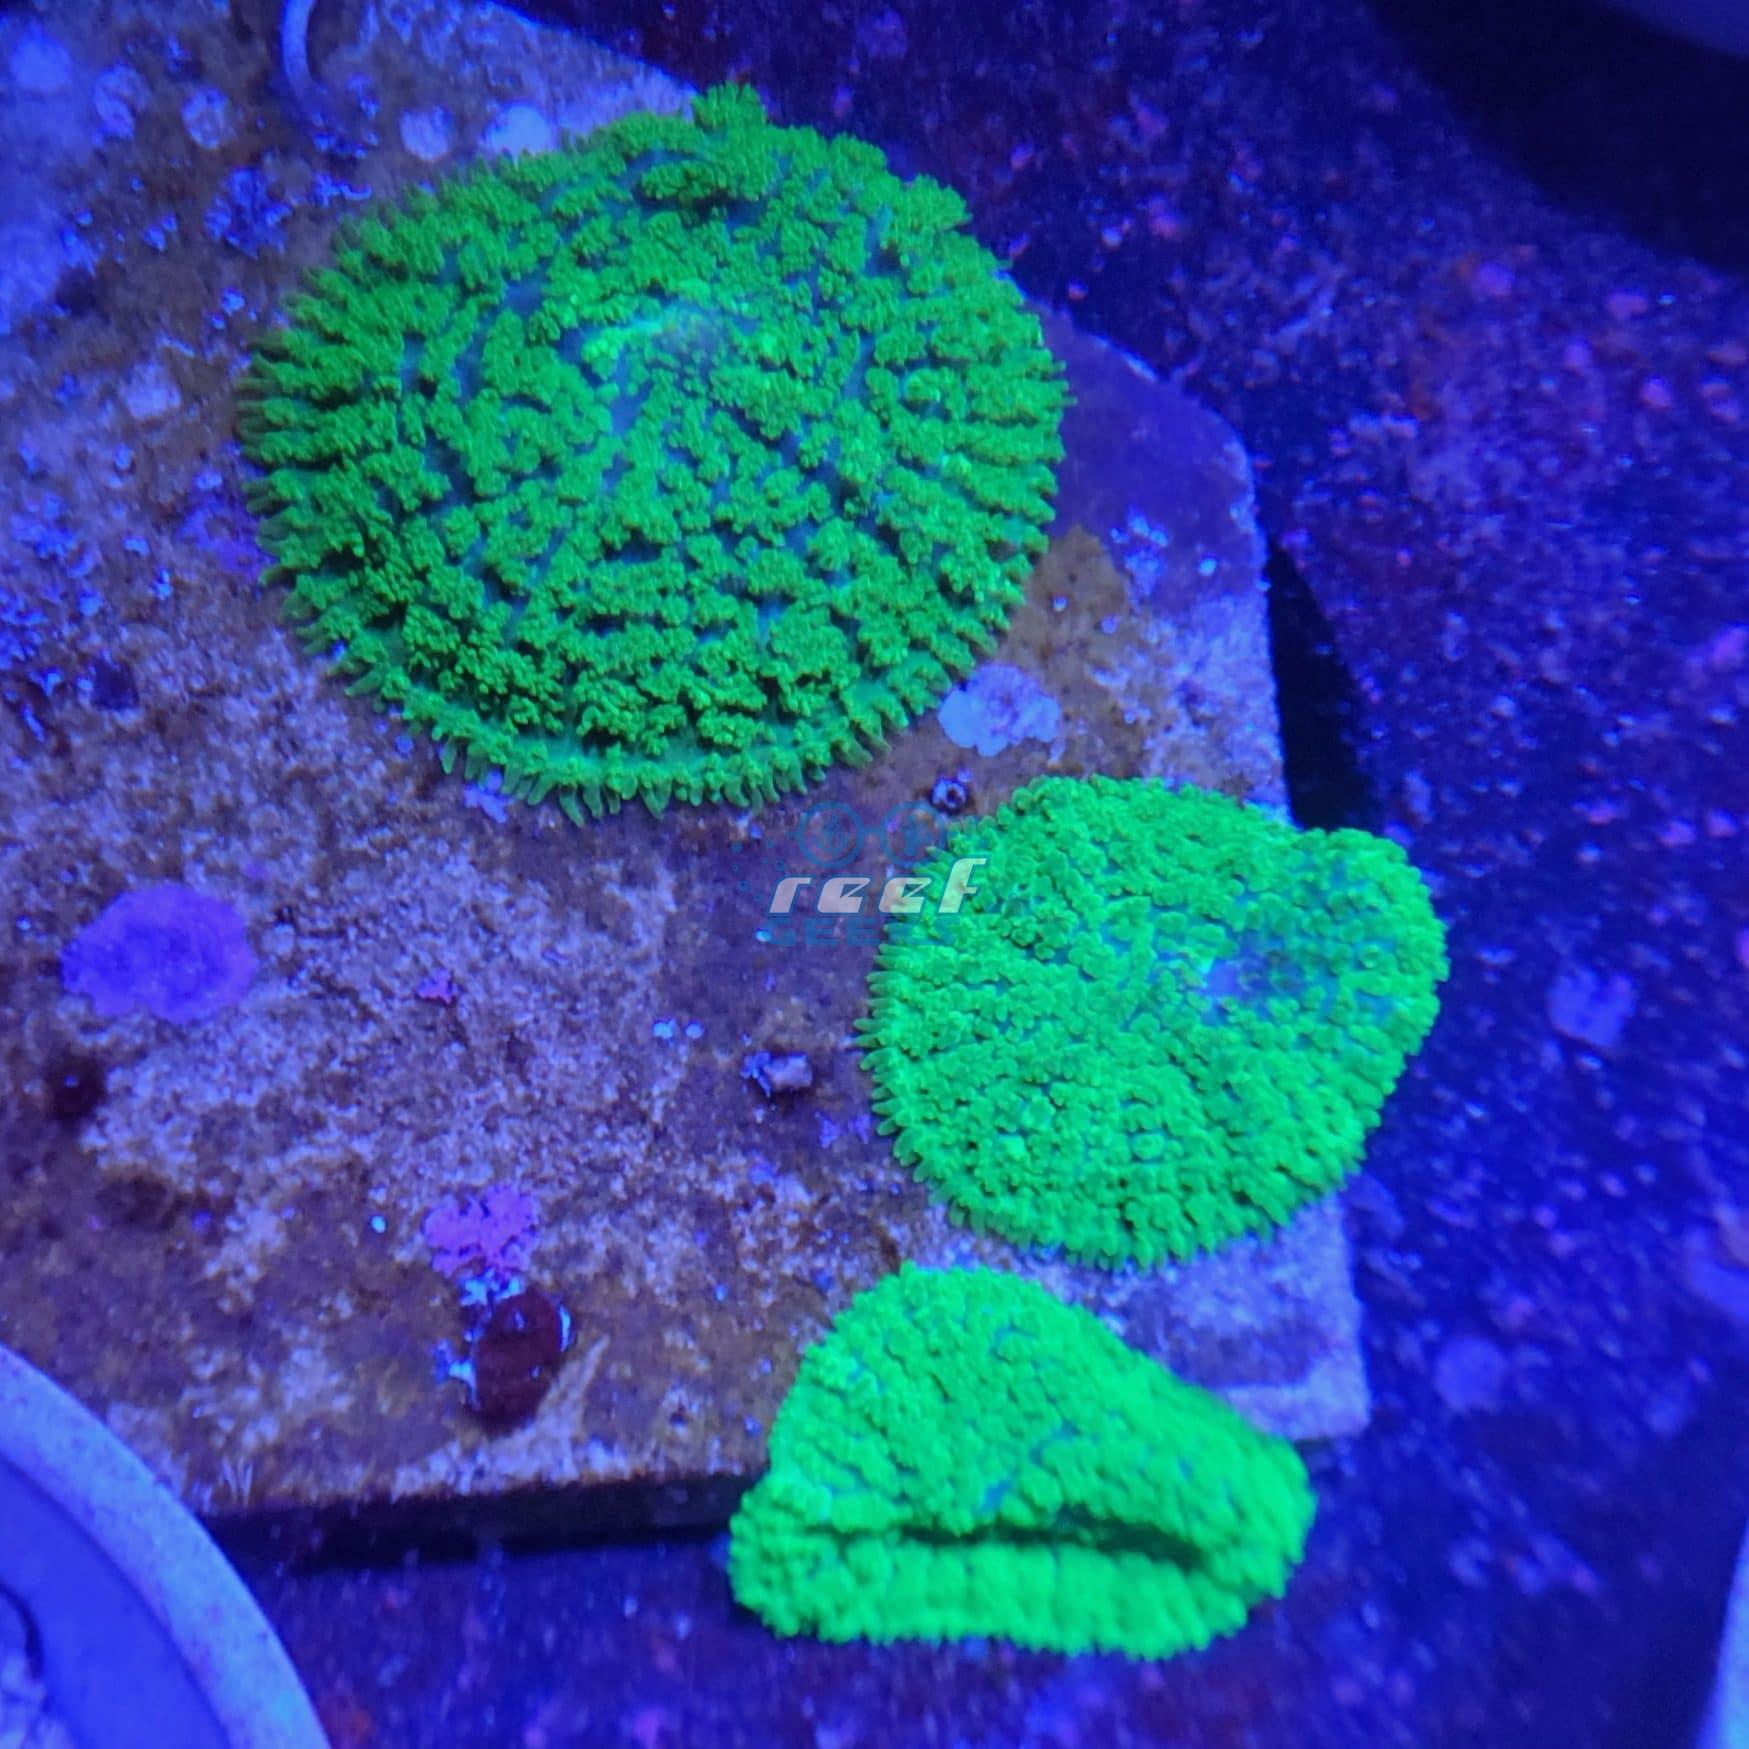 Toxic Green Mushroom